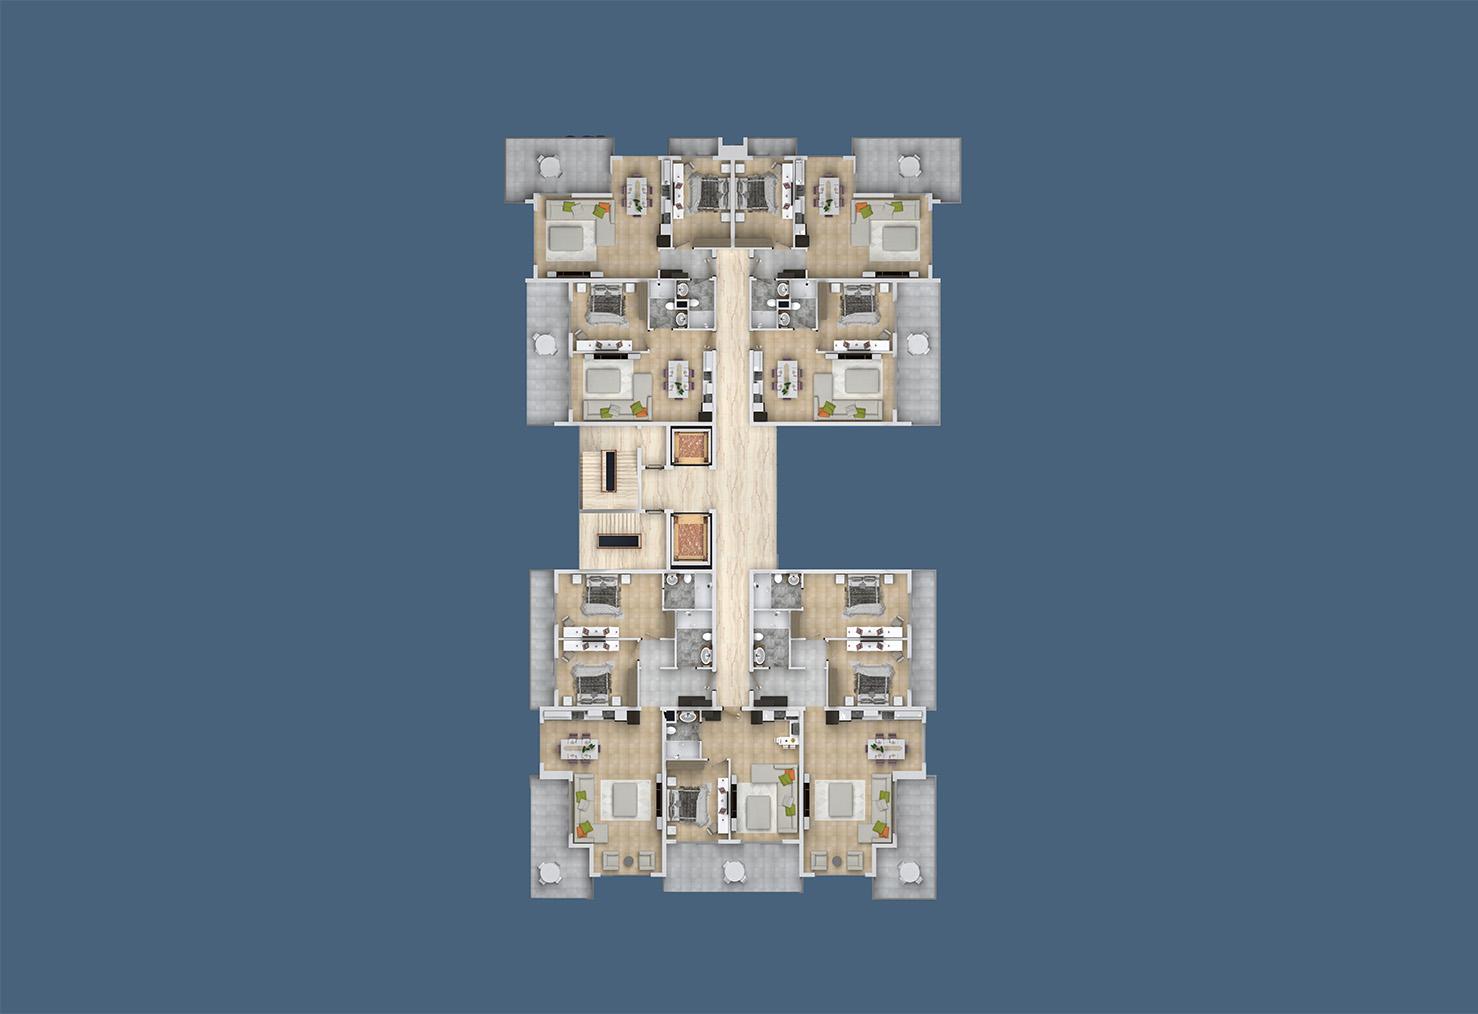 Floor plans of apartments 9 floor «D» Yekta Kingdom Trade Center